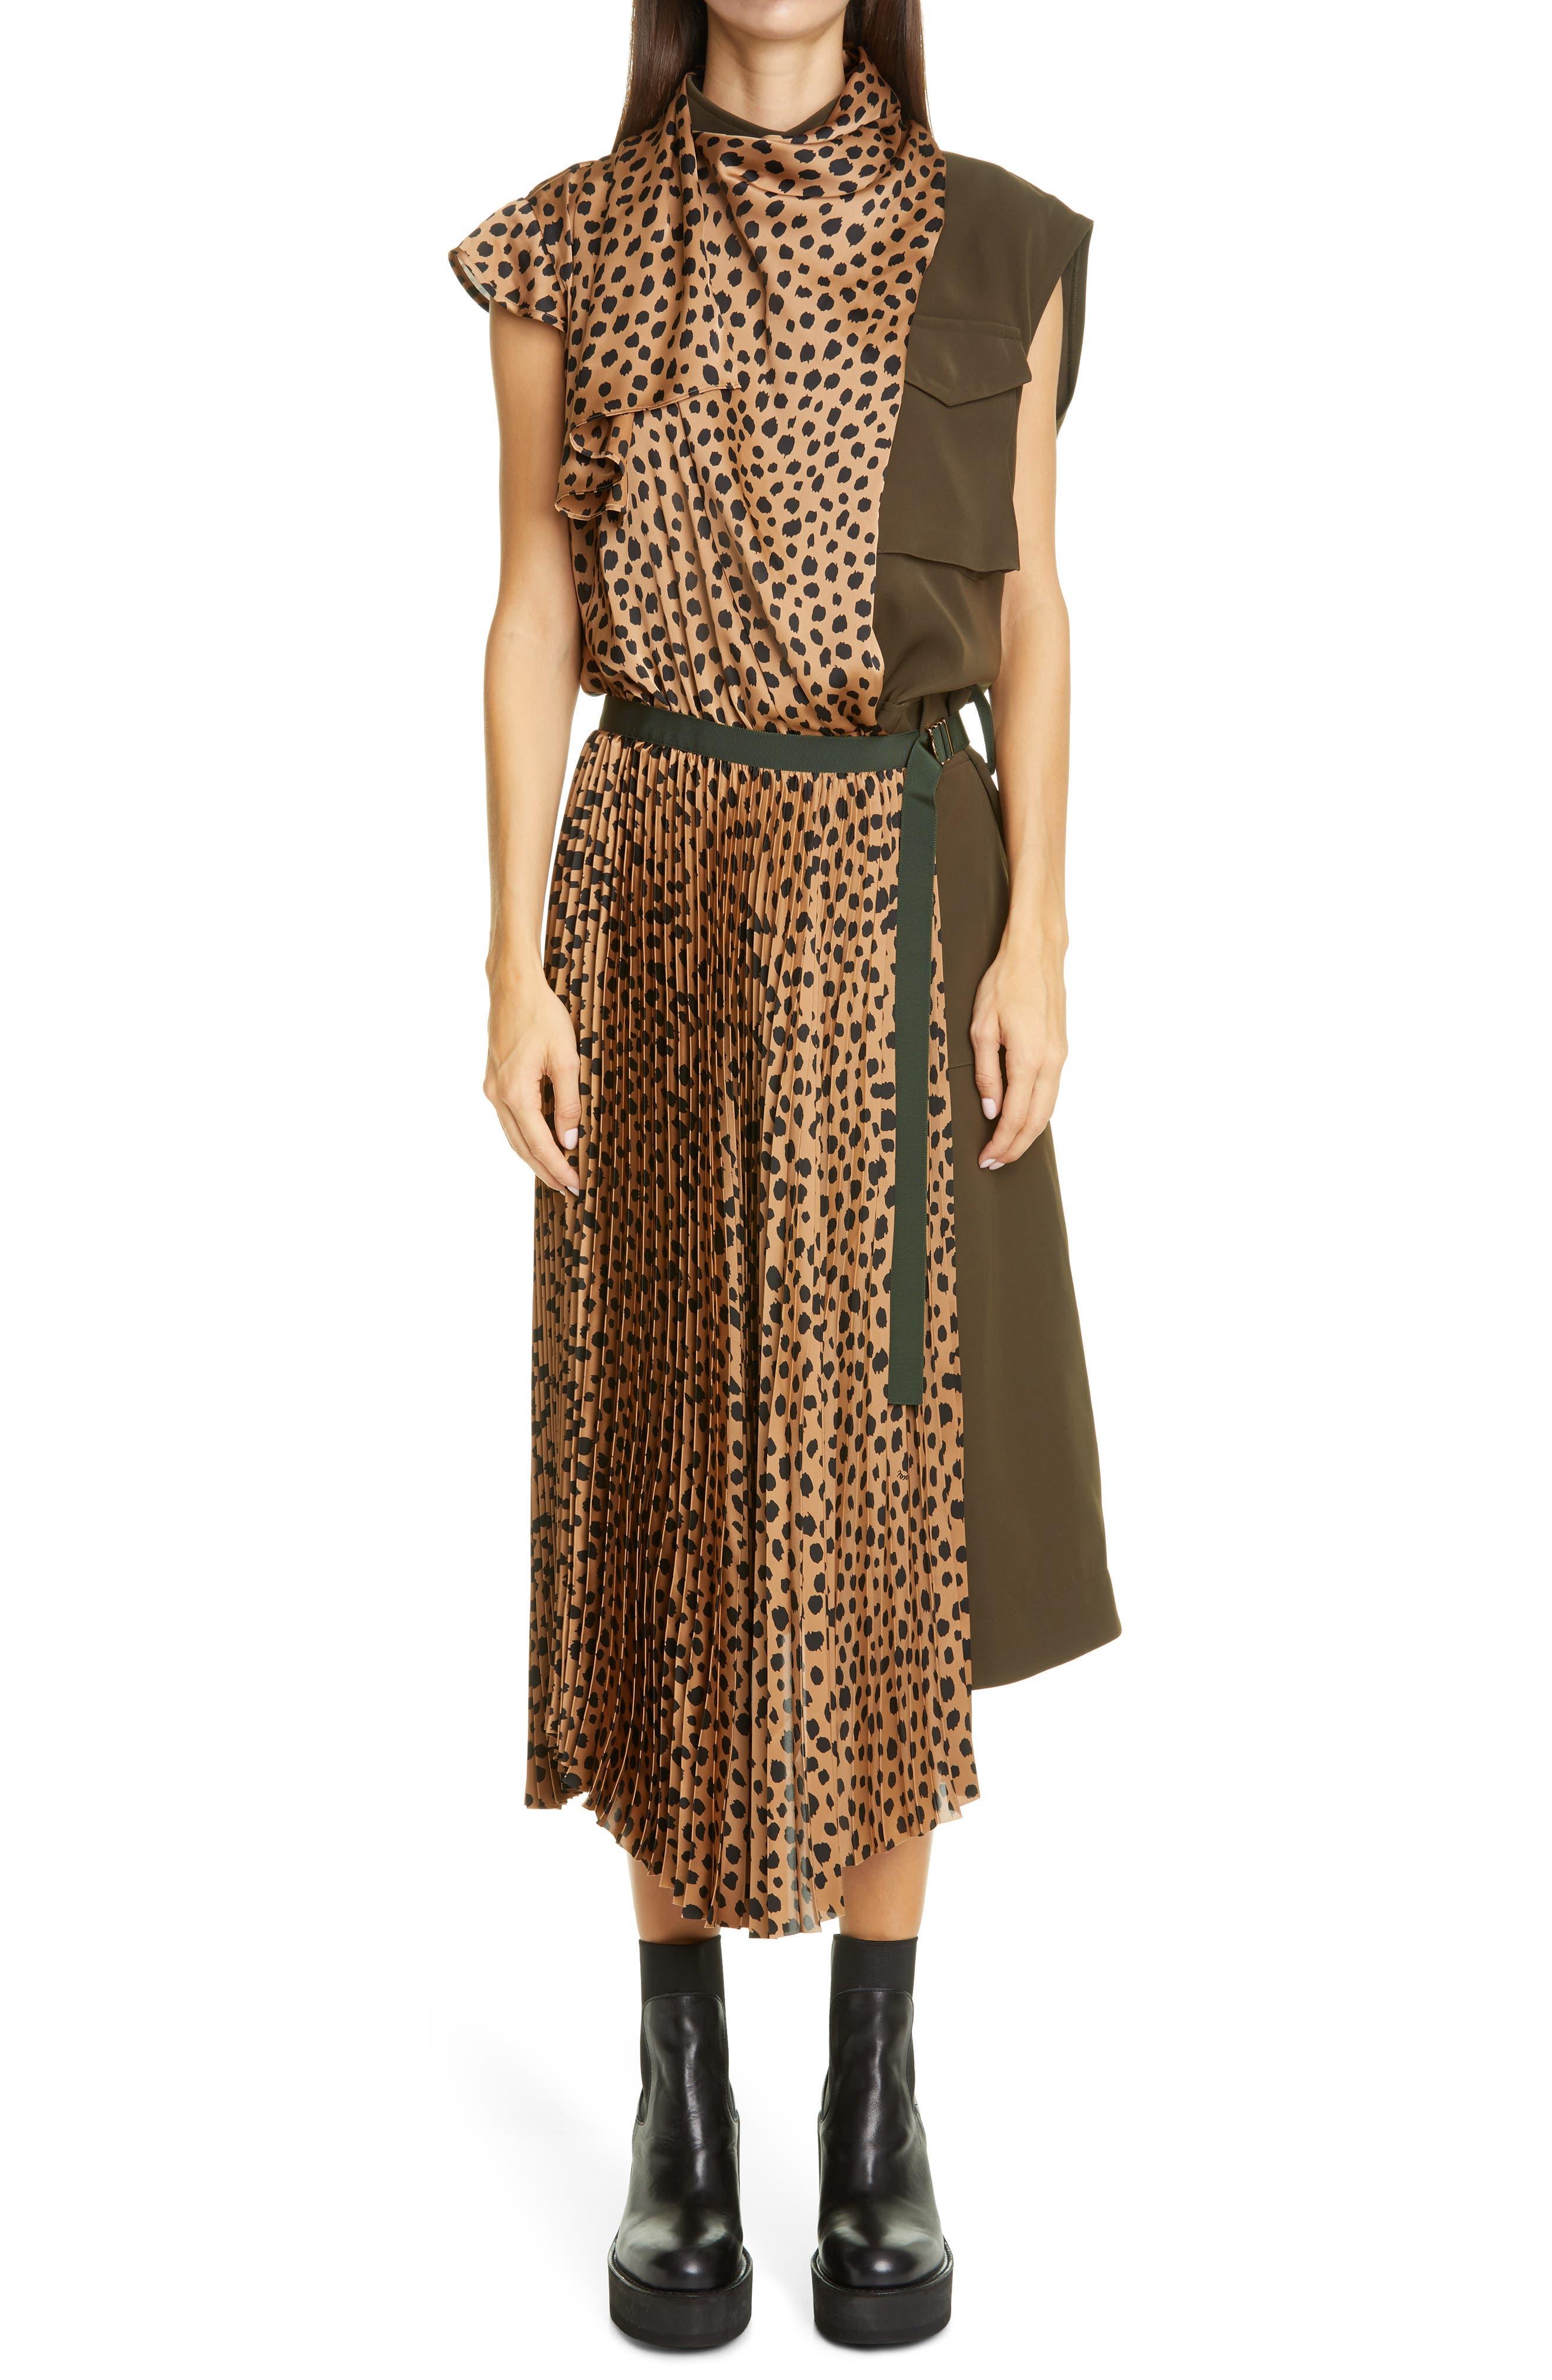 Sacai Cheetah Print Mixed Media Pleated Dress   Nordstrom